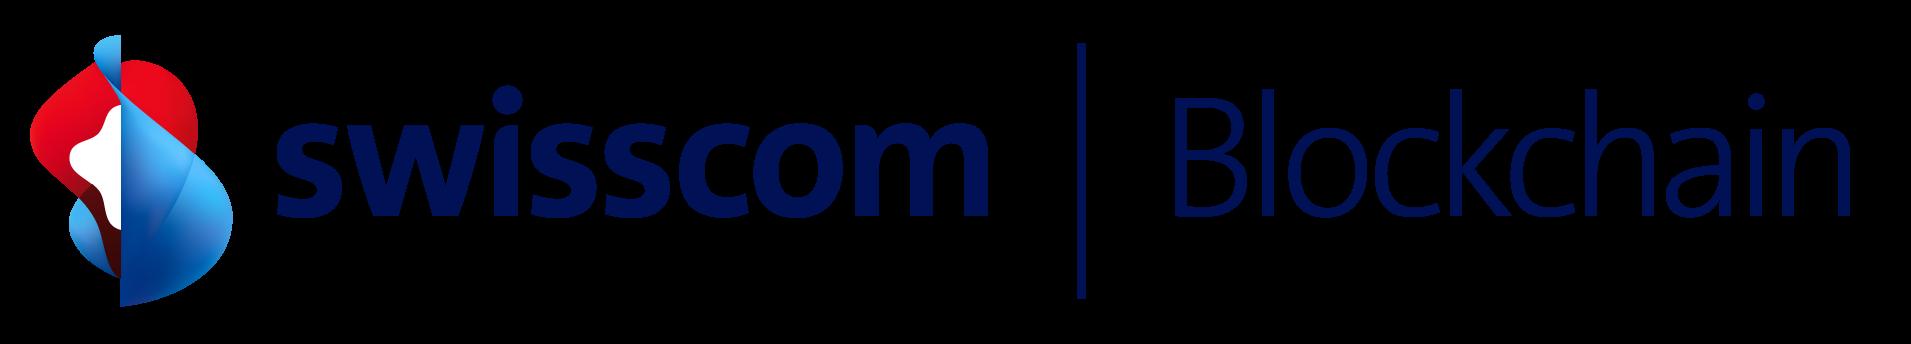 Swisscom_Blockchain_Restricted_Primary_RGB.png